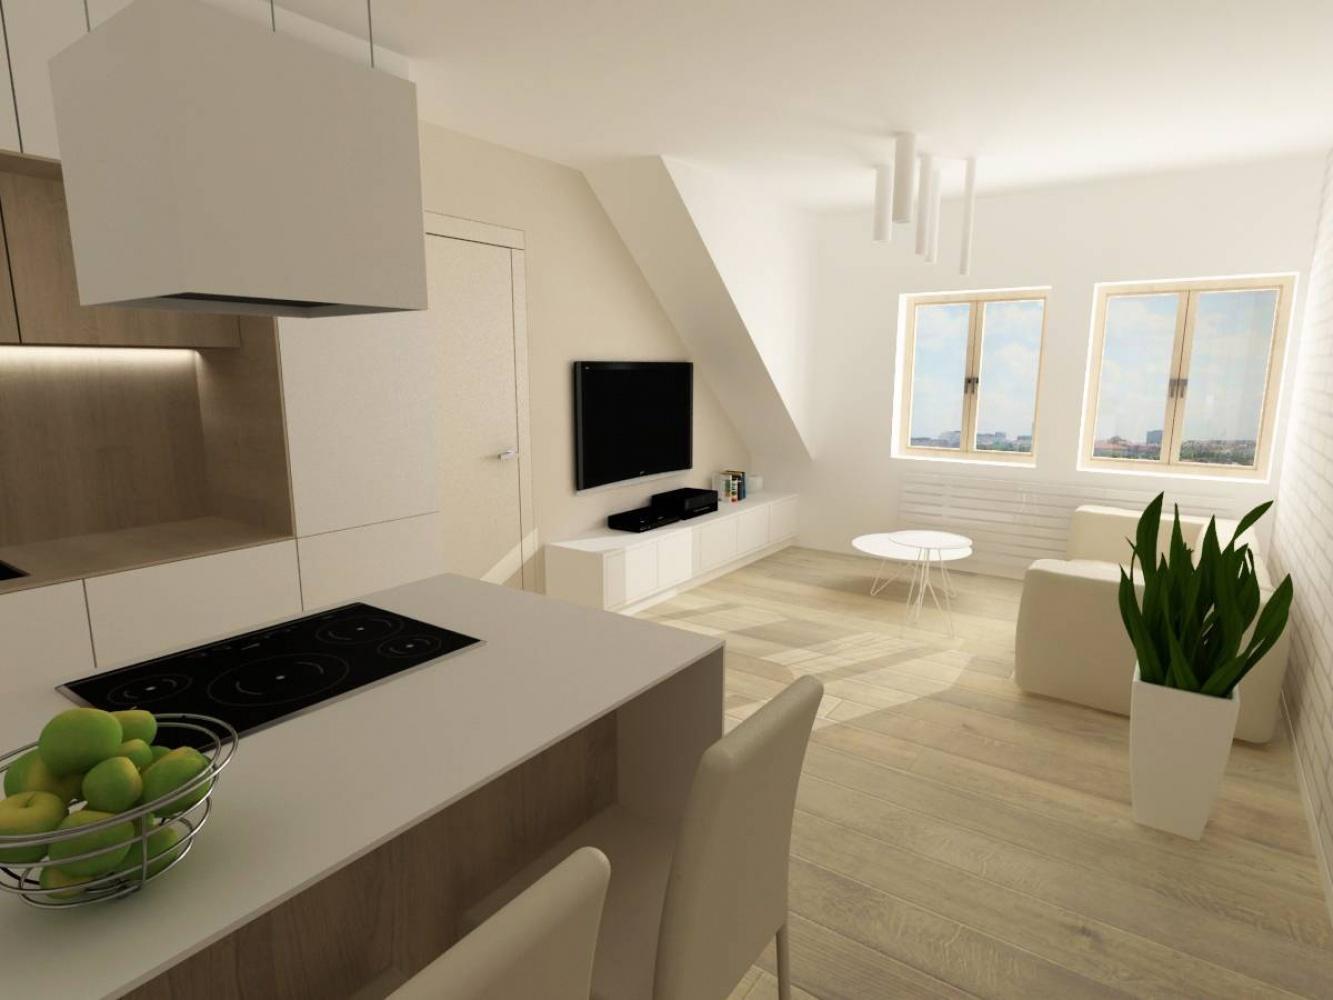 Půdní byt 2+kk, plocha 45 m², ulice Svatoslavova, Praha 4 - Nusle | 1